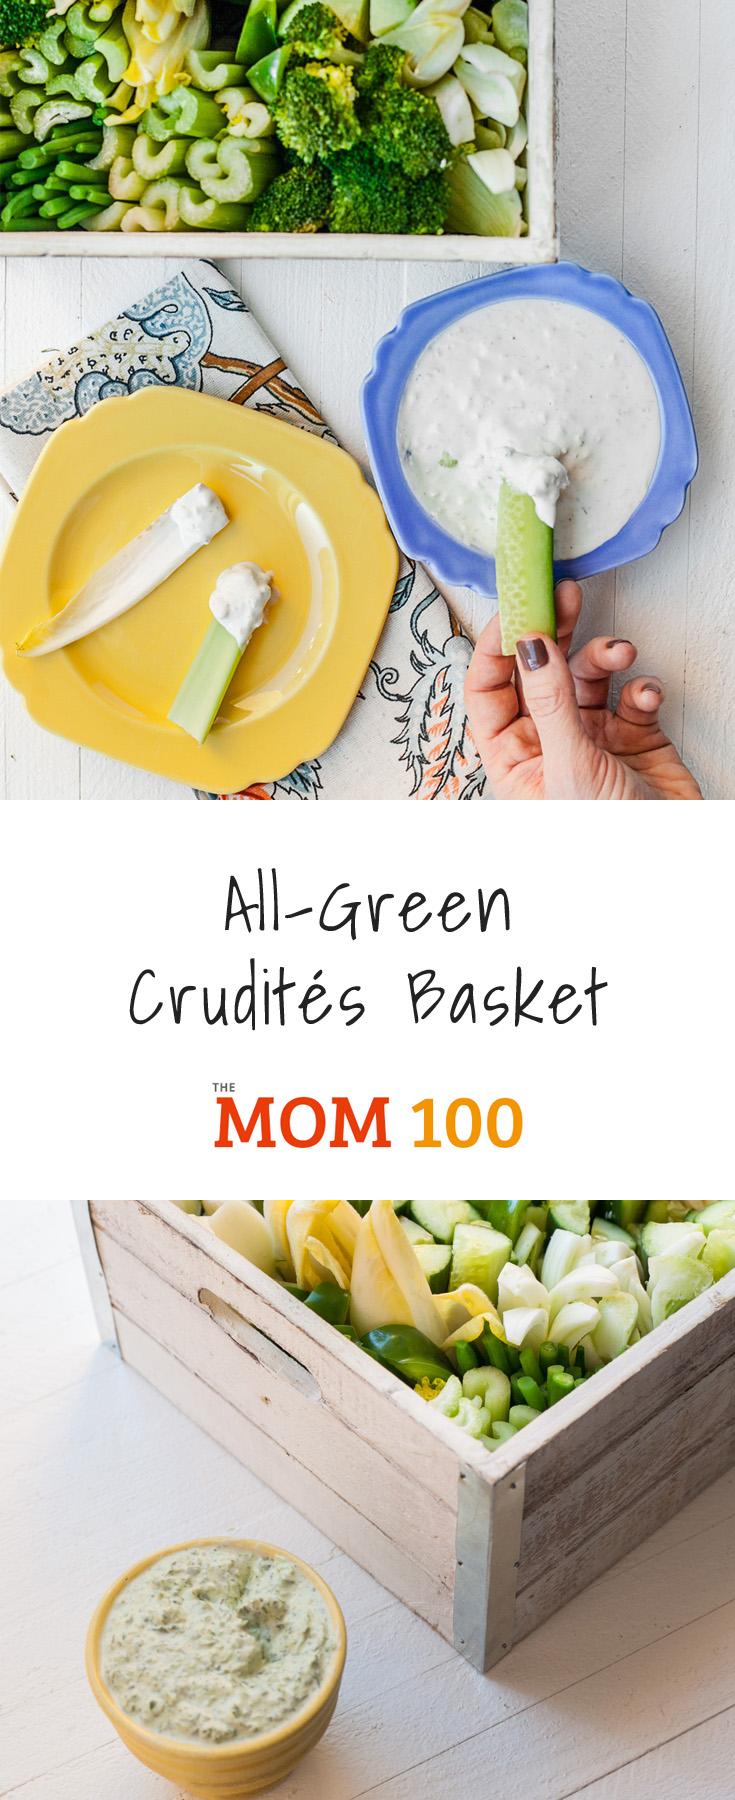 All-Green Crudite Basket